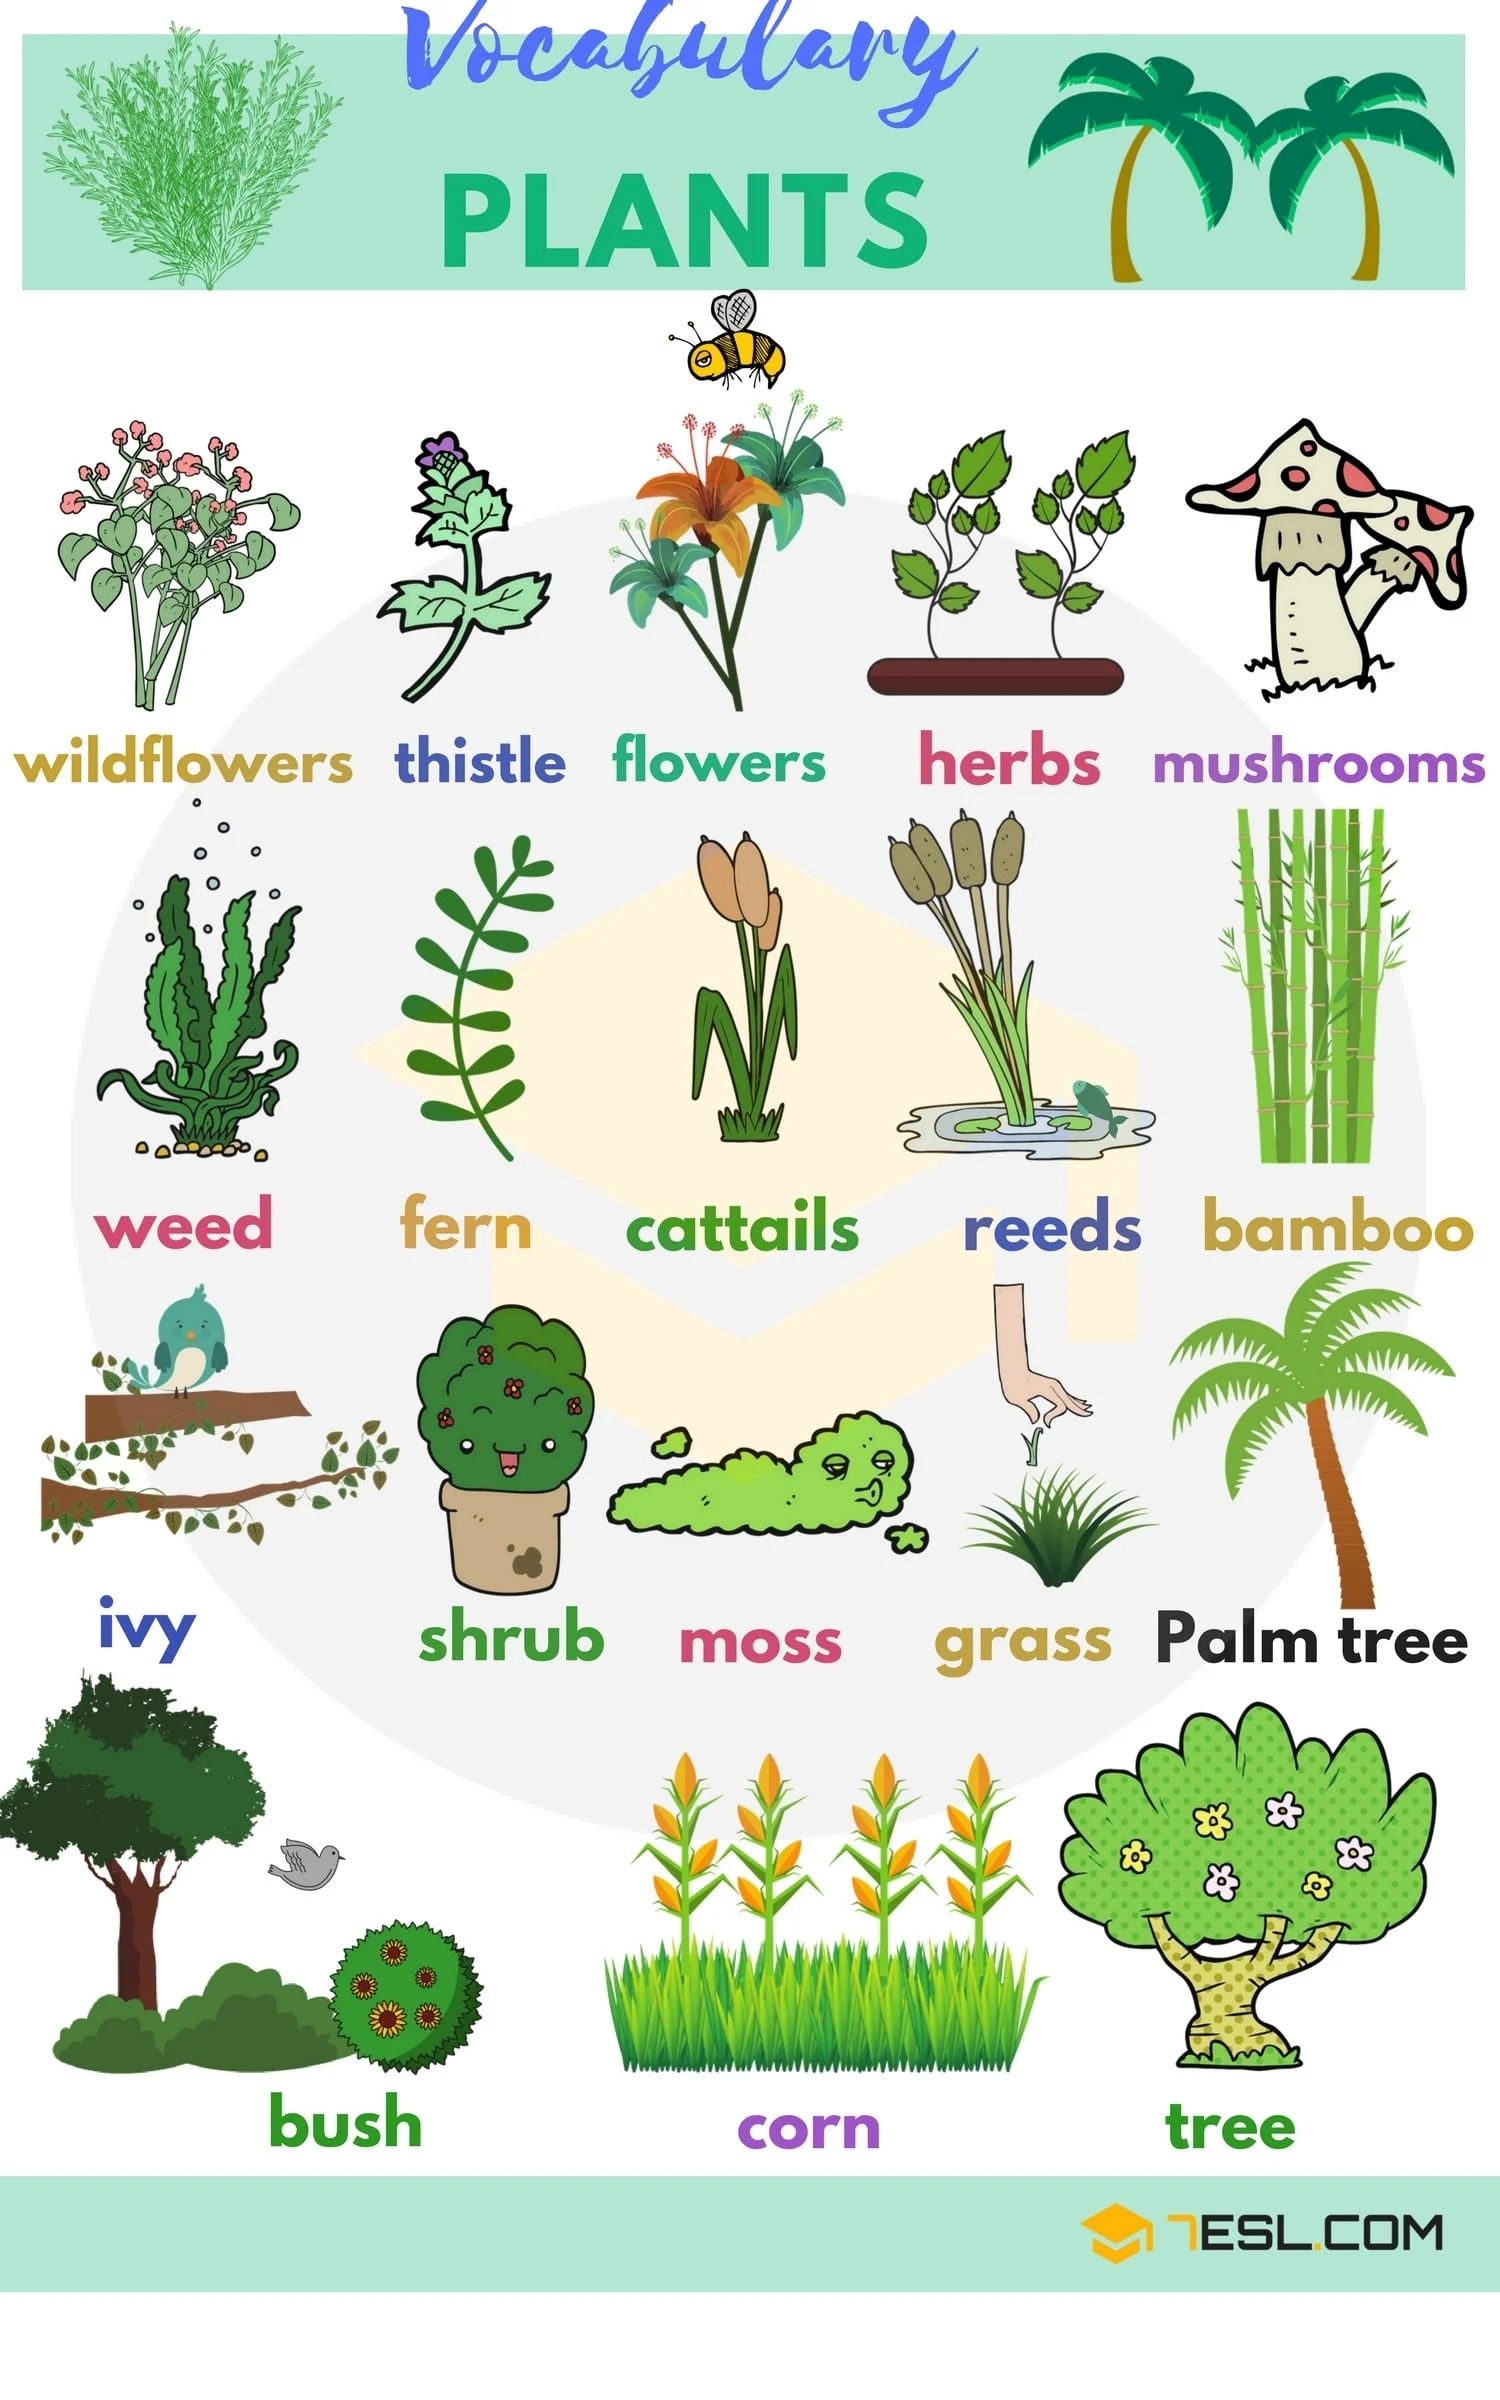 English Vocabulary for Plants